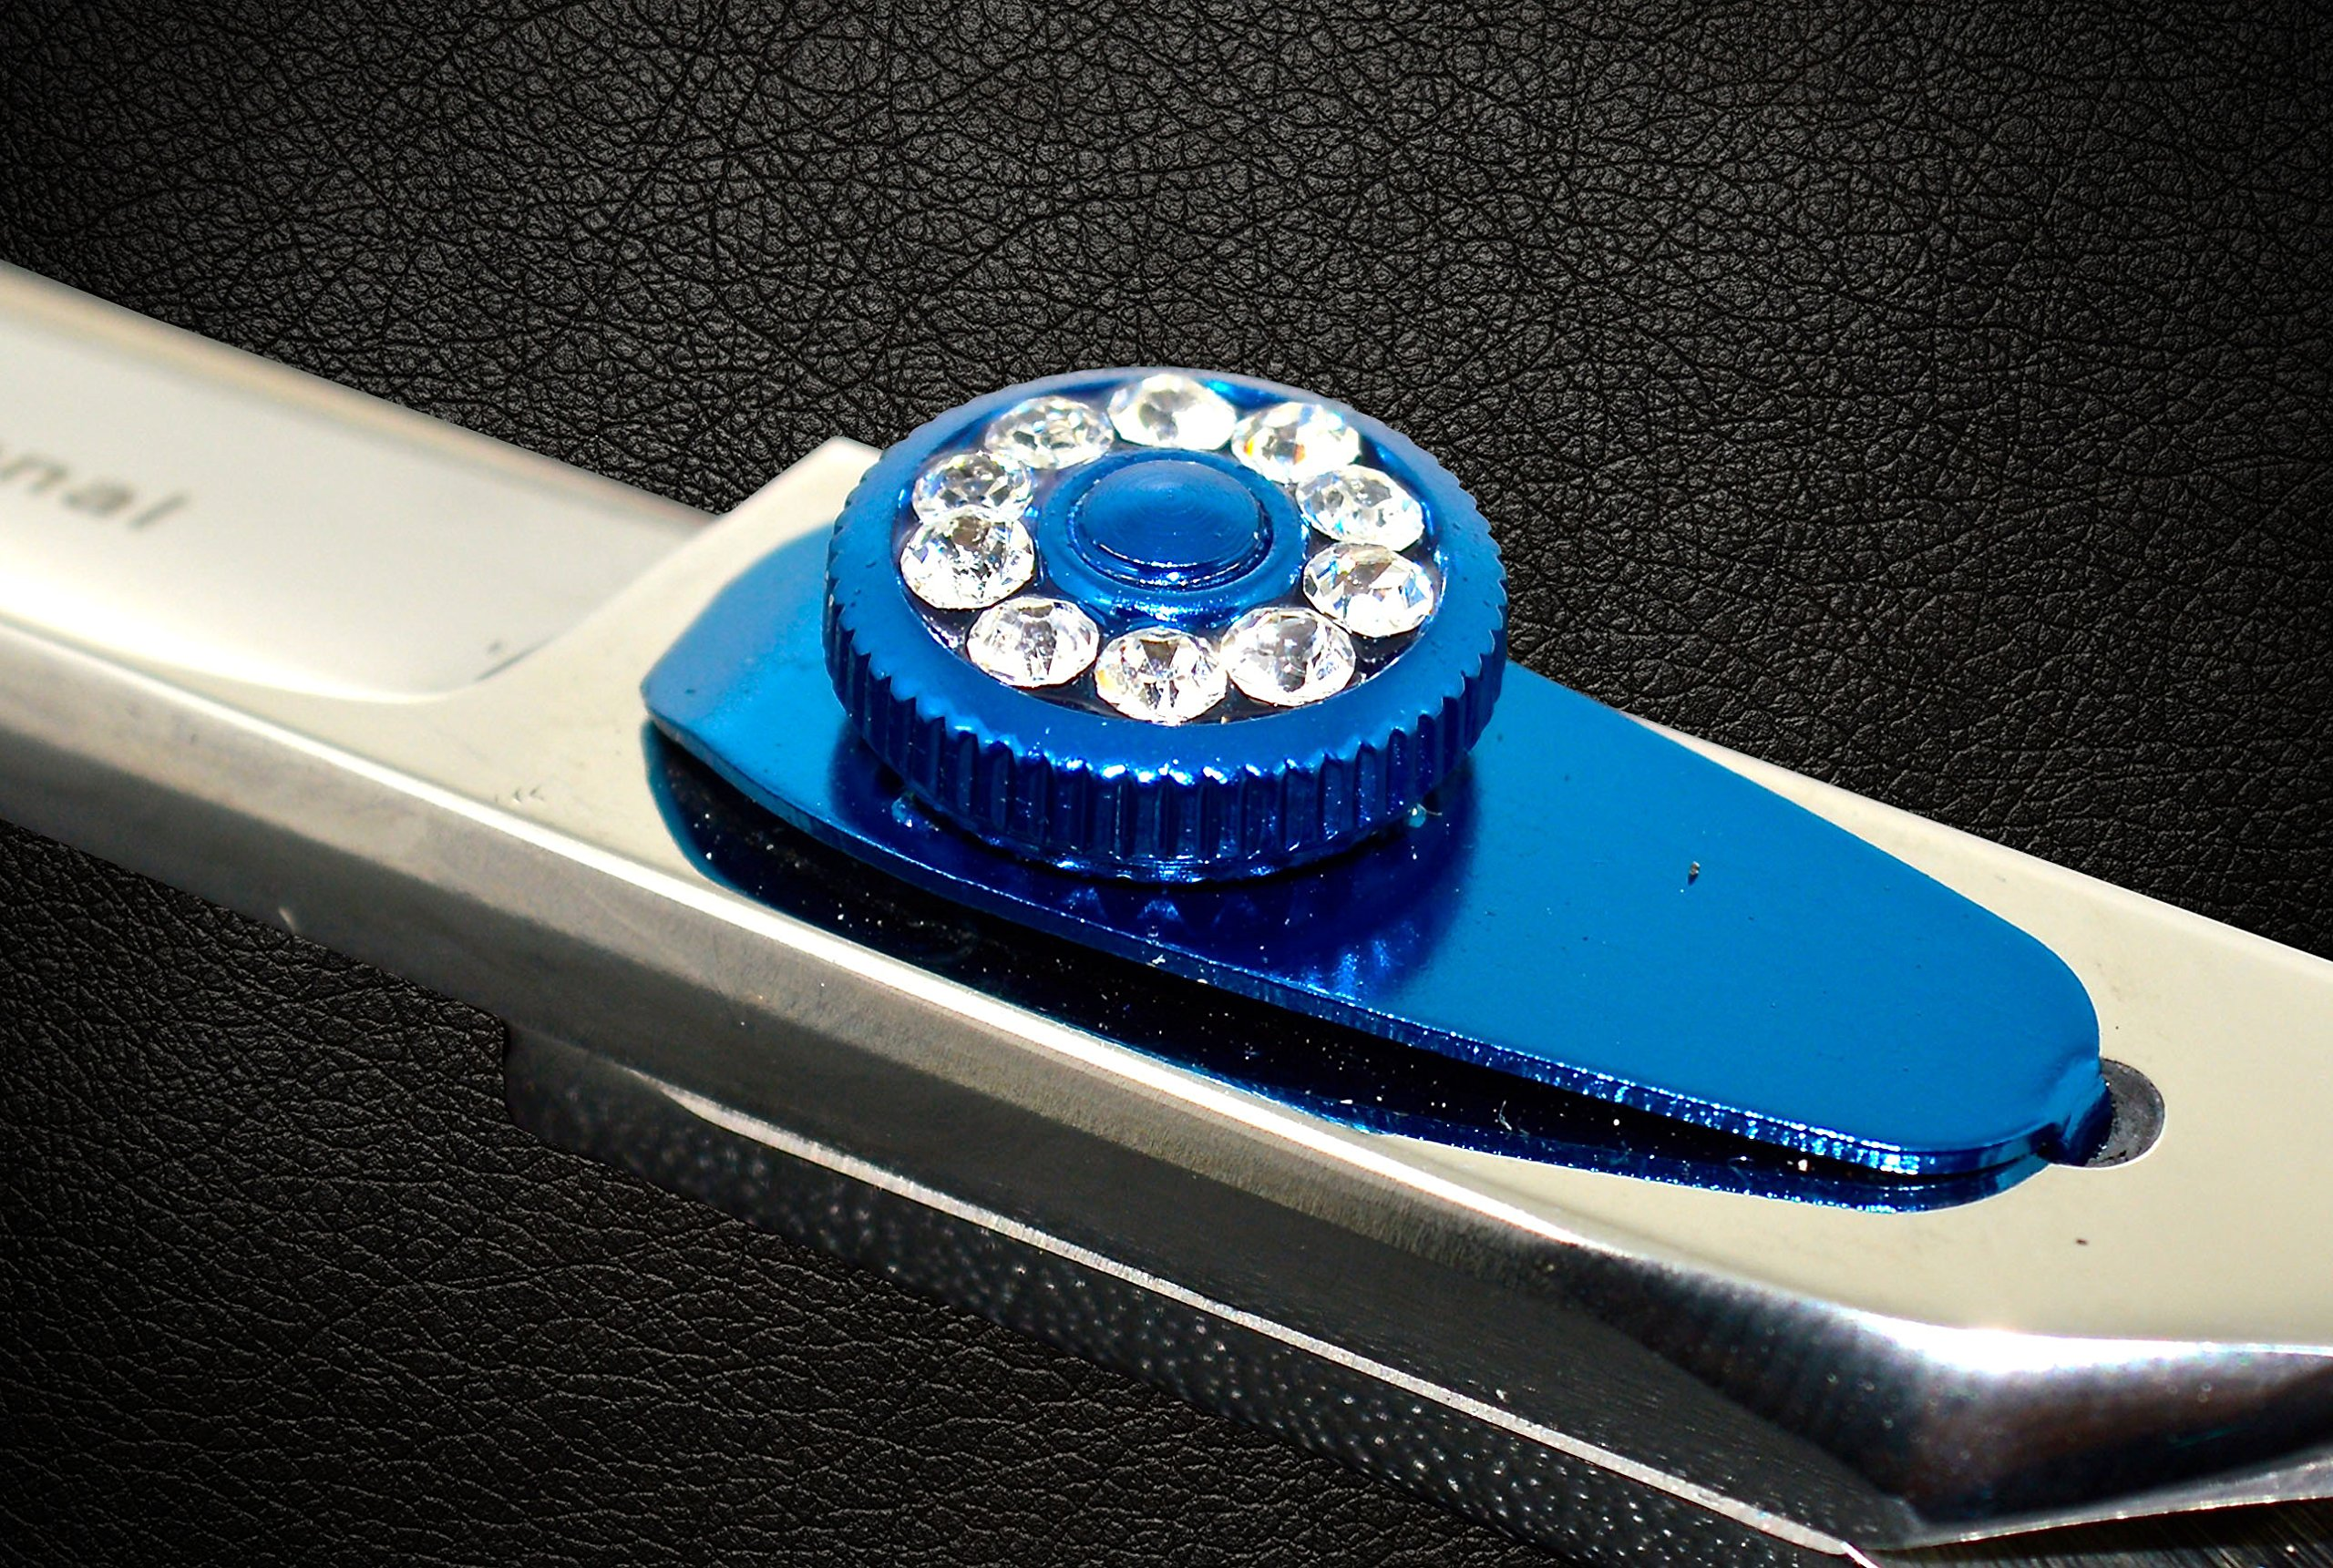 Equinox Professional Razor Edge Series - Barber Hair Cutting Scissors/Shears - 6.5'' Overall Length - Beautiful White Diamond Stones with Blue Chromium Fine Adjustment Tension Screw by Equinox International (Image #4)